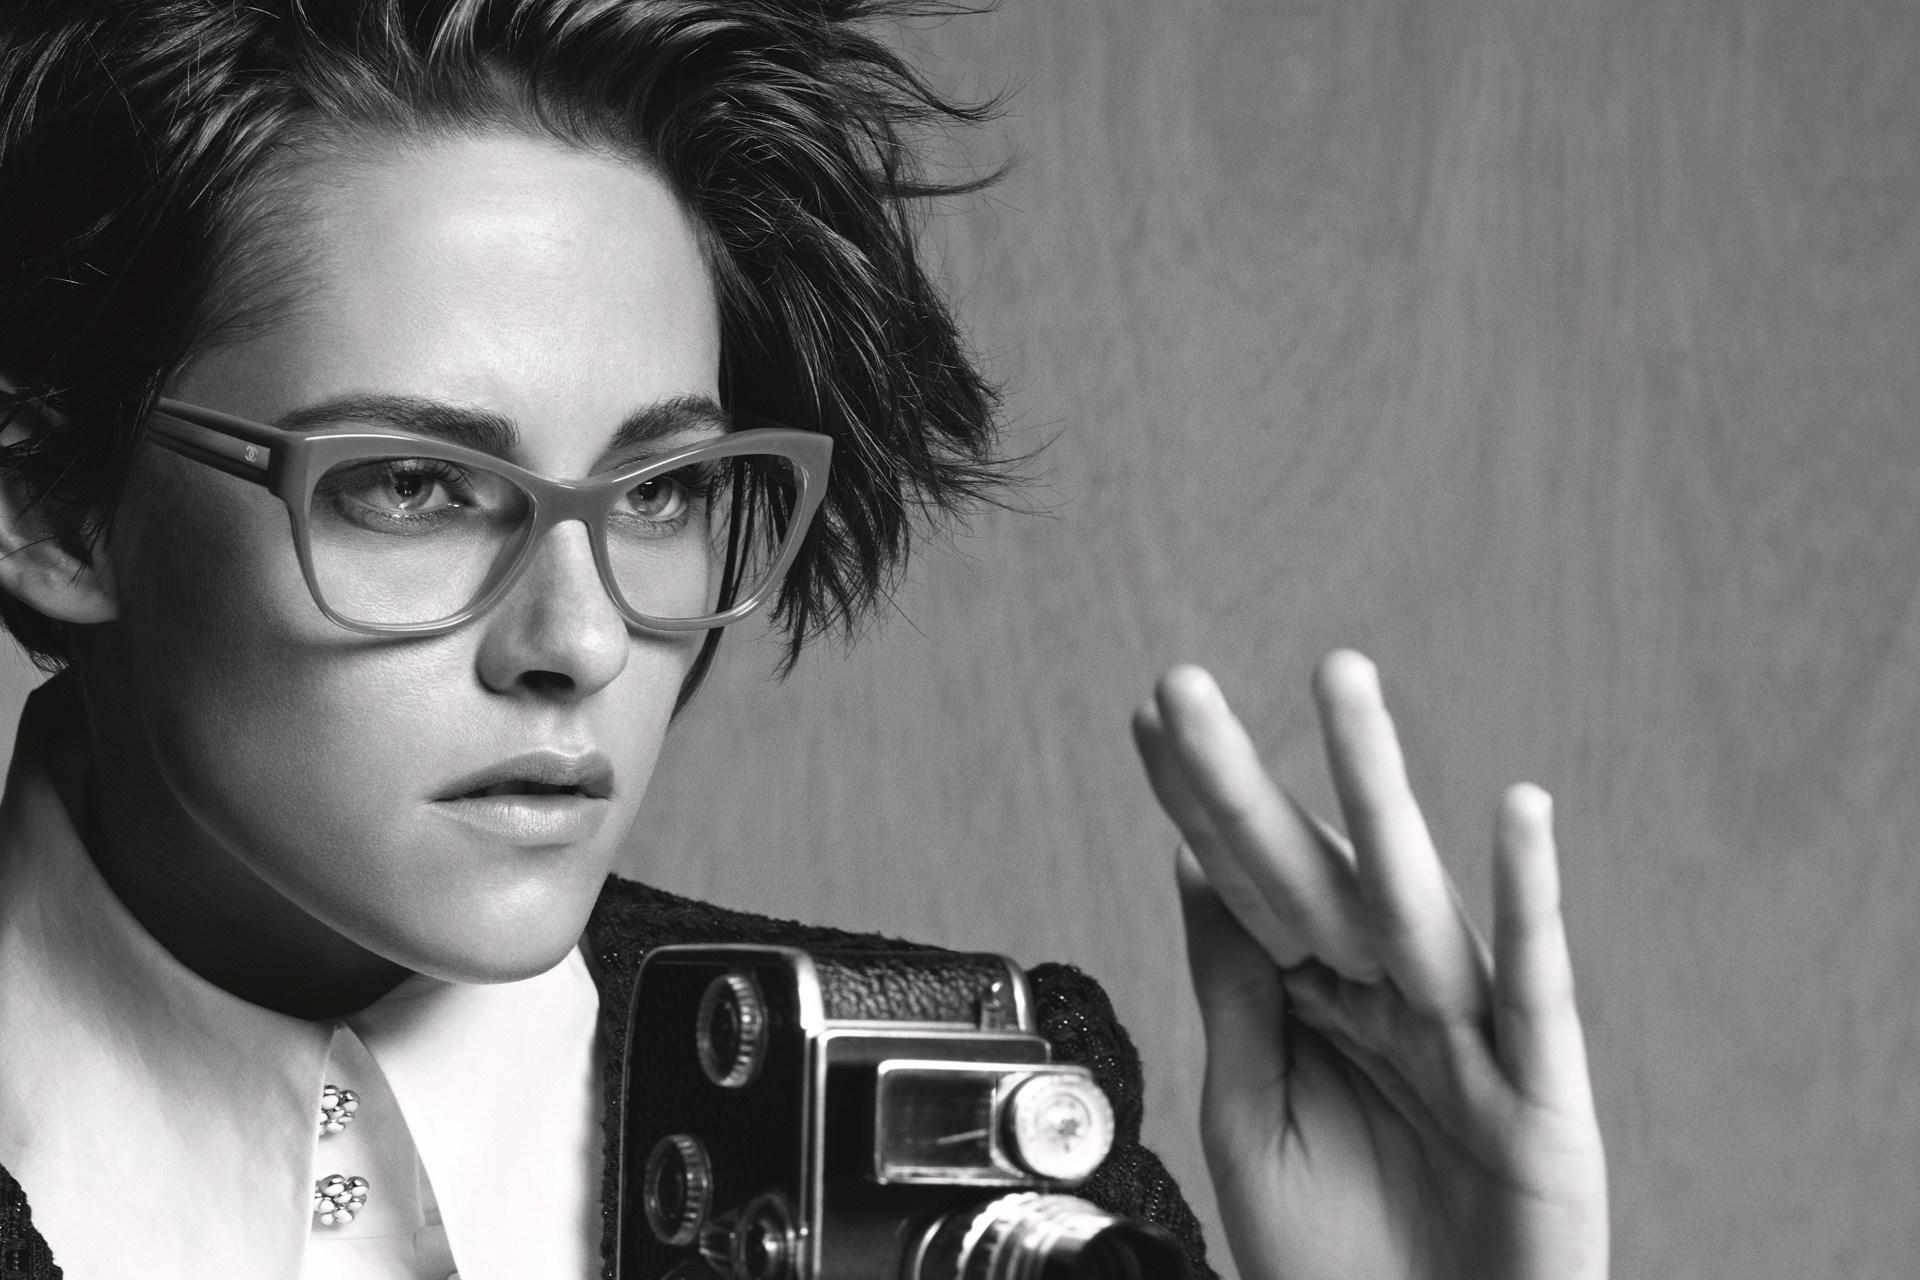 CHANEL-eyewear-kristen-stewart-Karl-Lagerfeld-1-vogue-8apr15-pr b b39ef